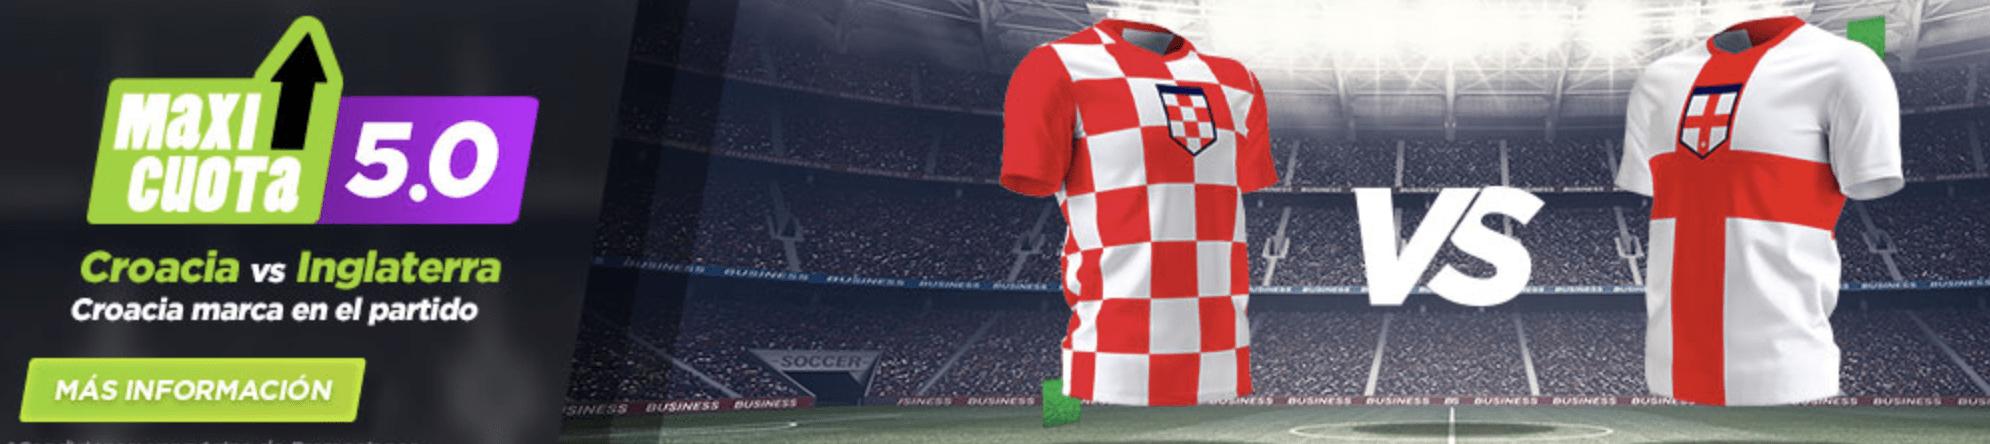 Supercuotas vivelasuerte Croacia - Inglaterra